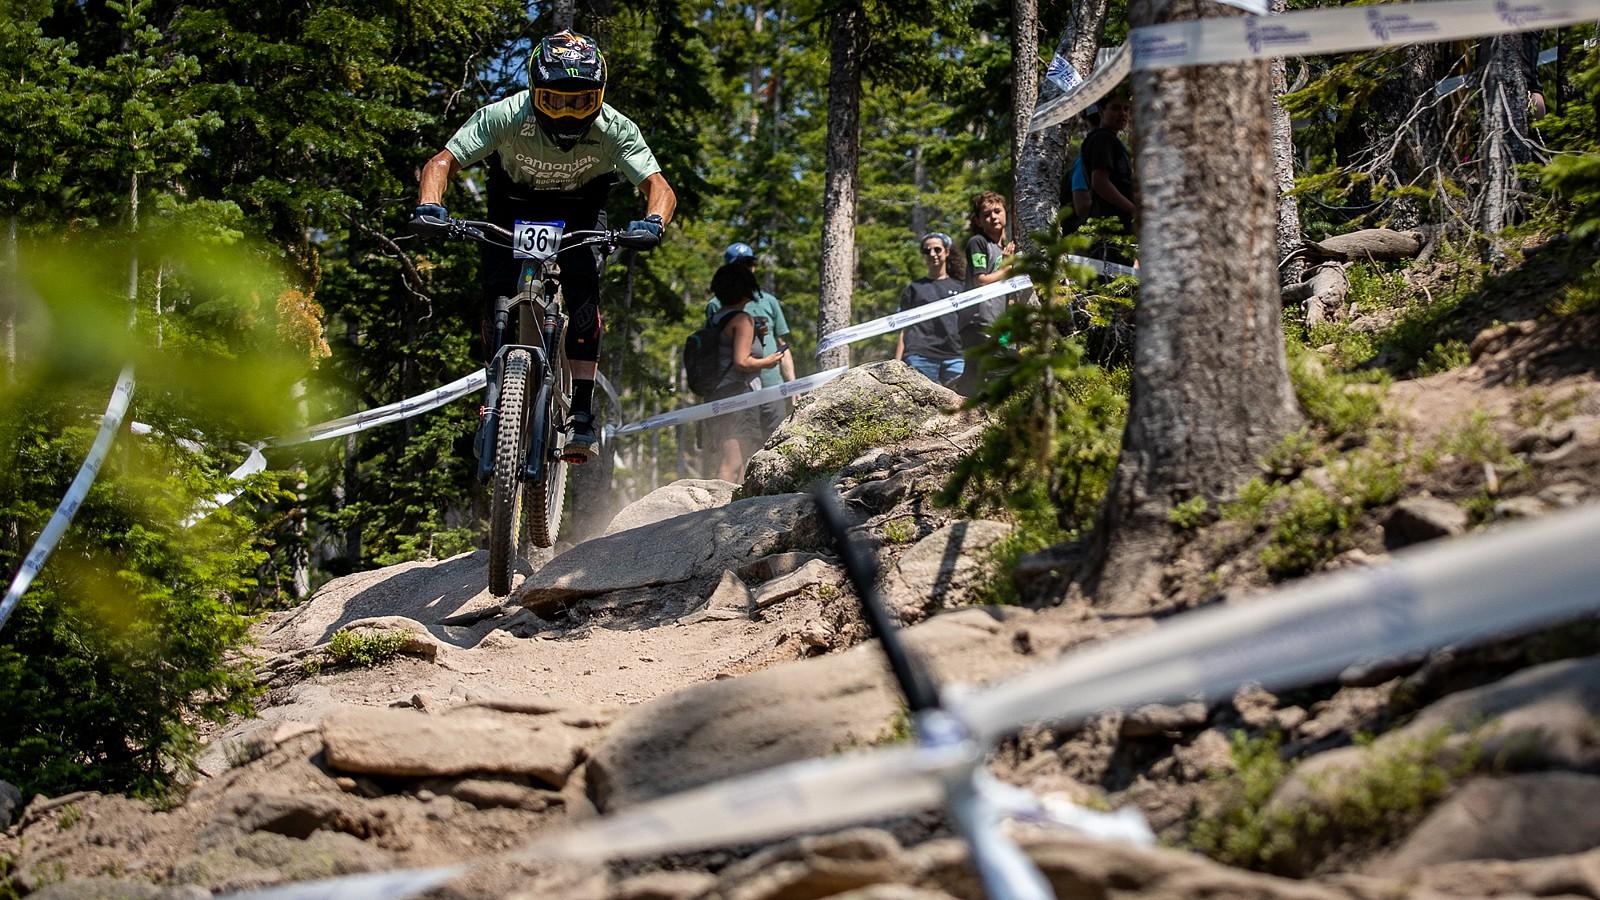 Mitch Ropelato - US National Champs Downhill Photo Blast - Mountain Biking Pictures - Vital MTB